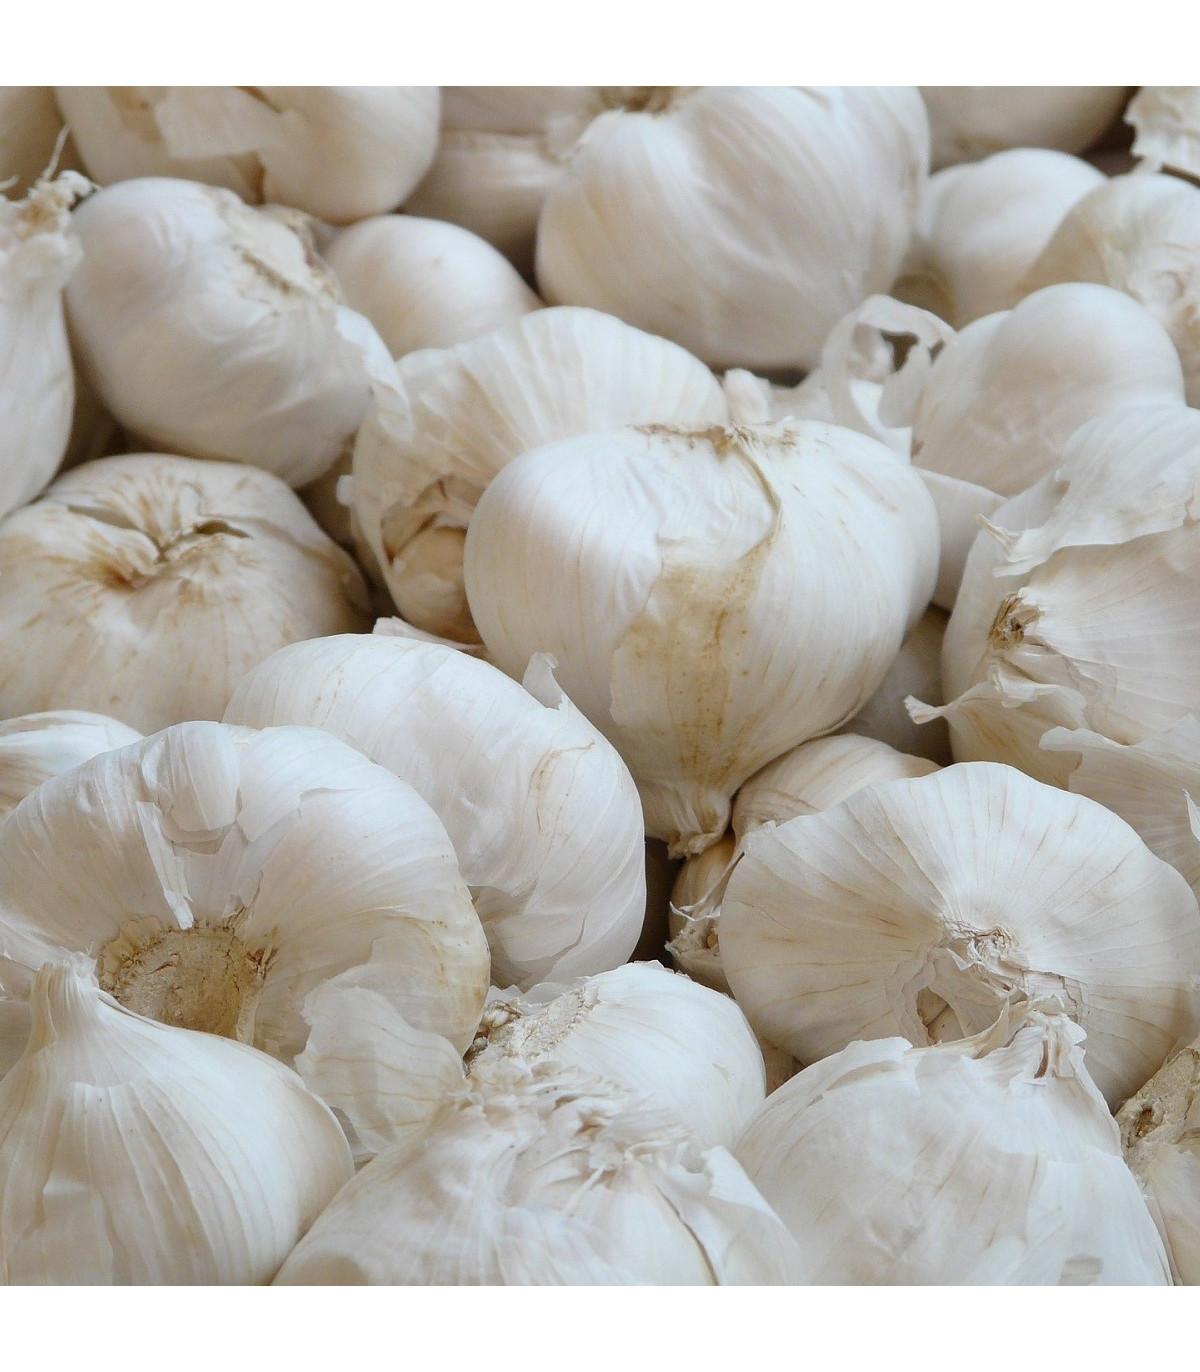 Sadbový cesnak Lukan nepaličiak - Allium sativum - predaj cibulí cesnaku - 3–4 ks